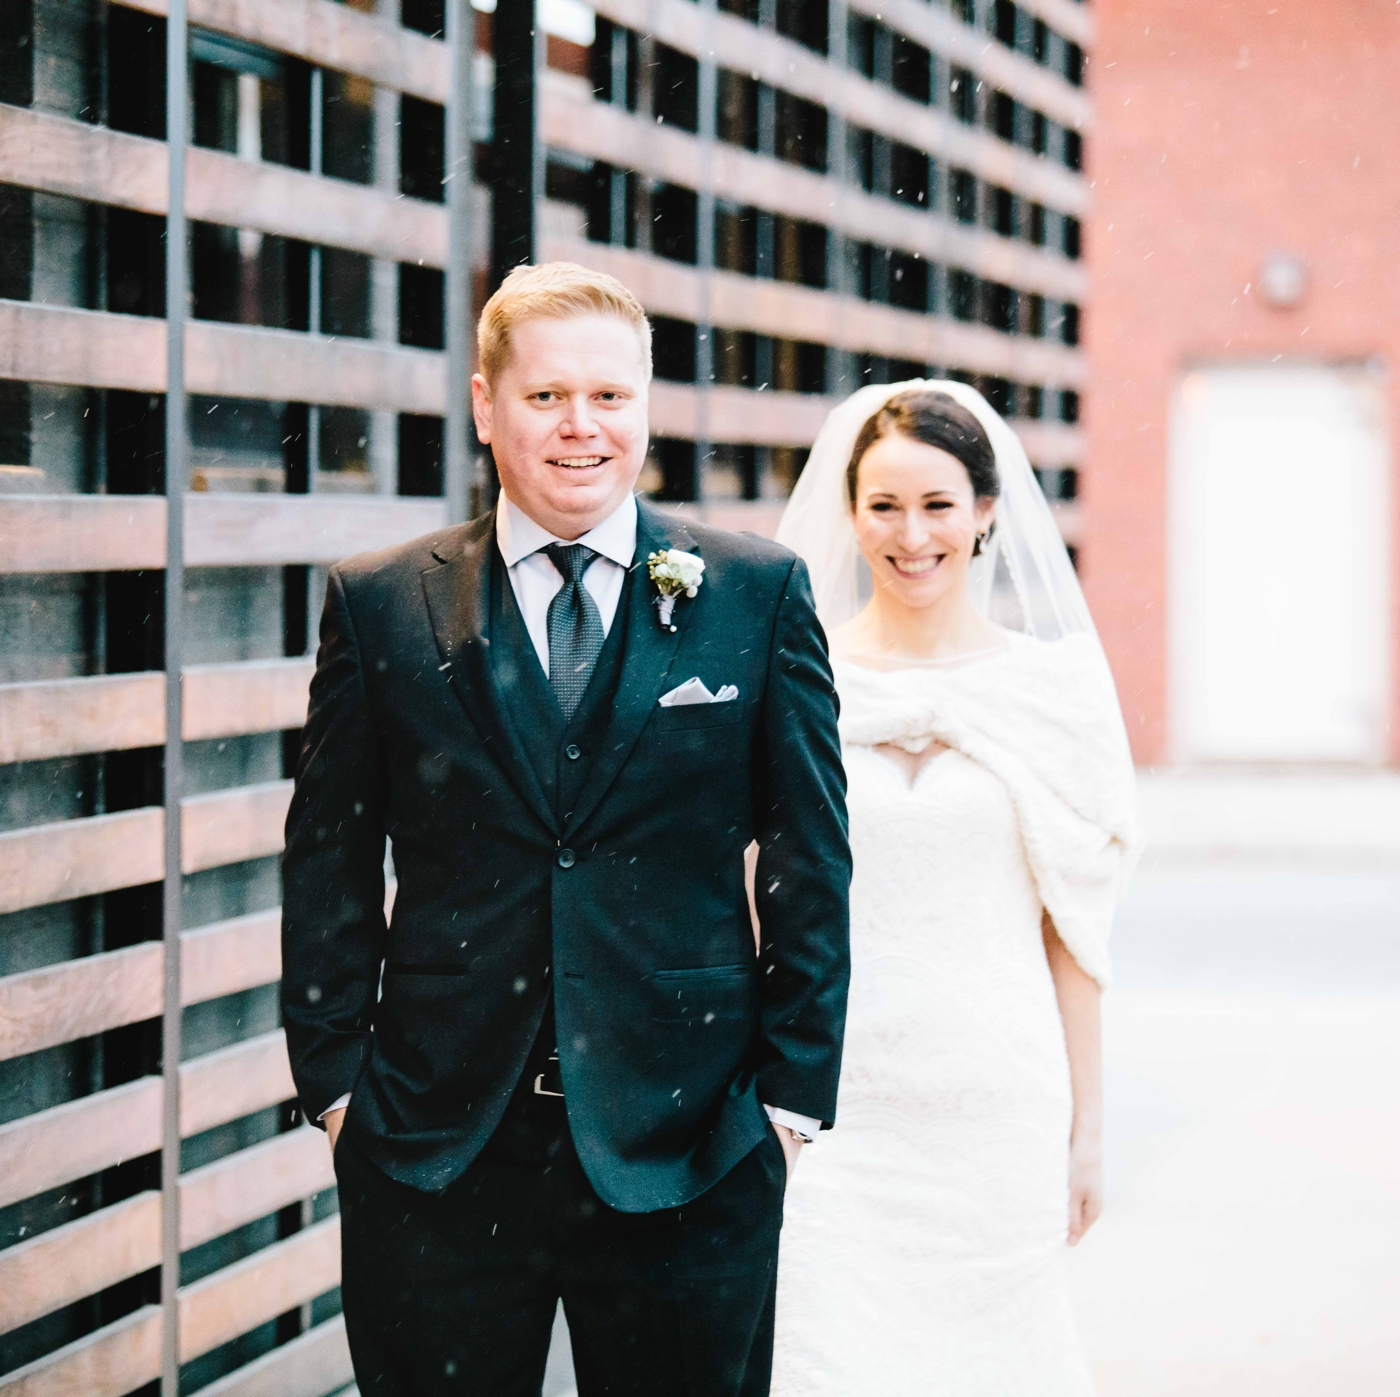 chicago-fine-art-wedding-photography-lintelman13